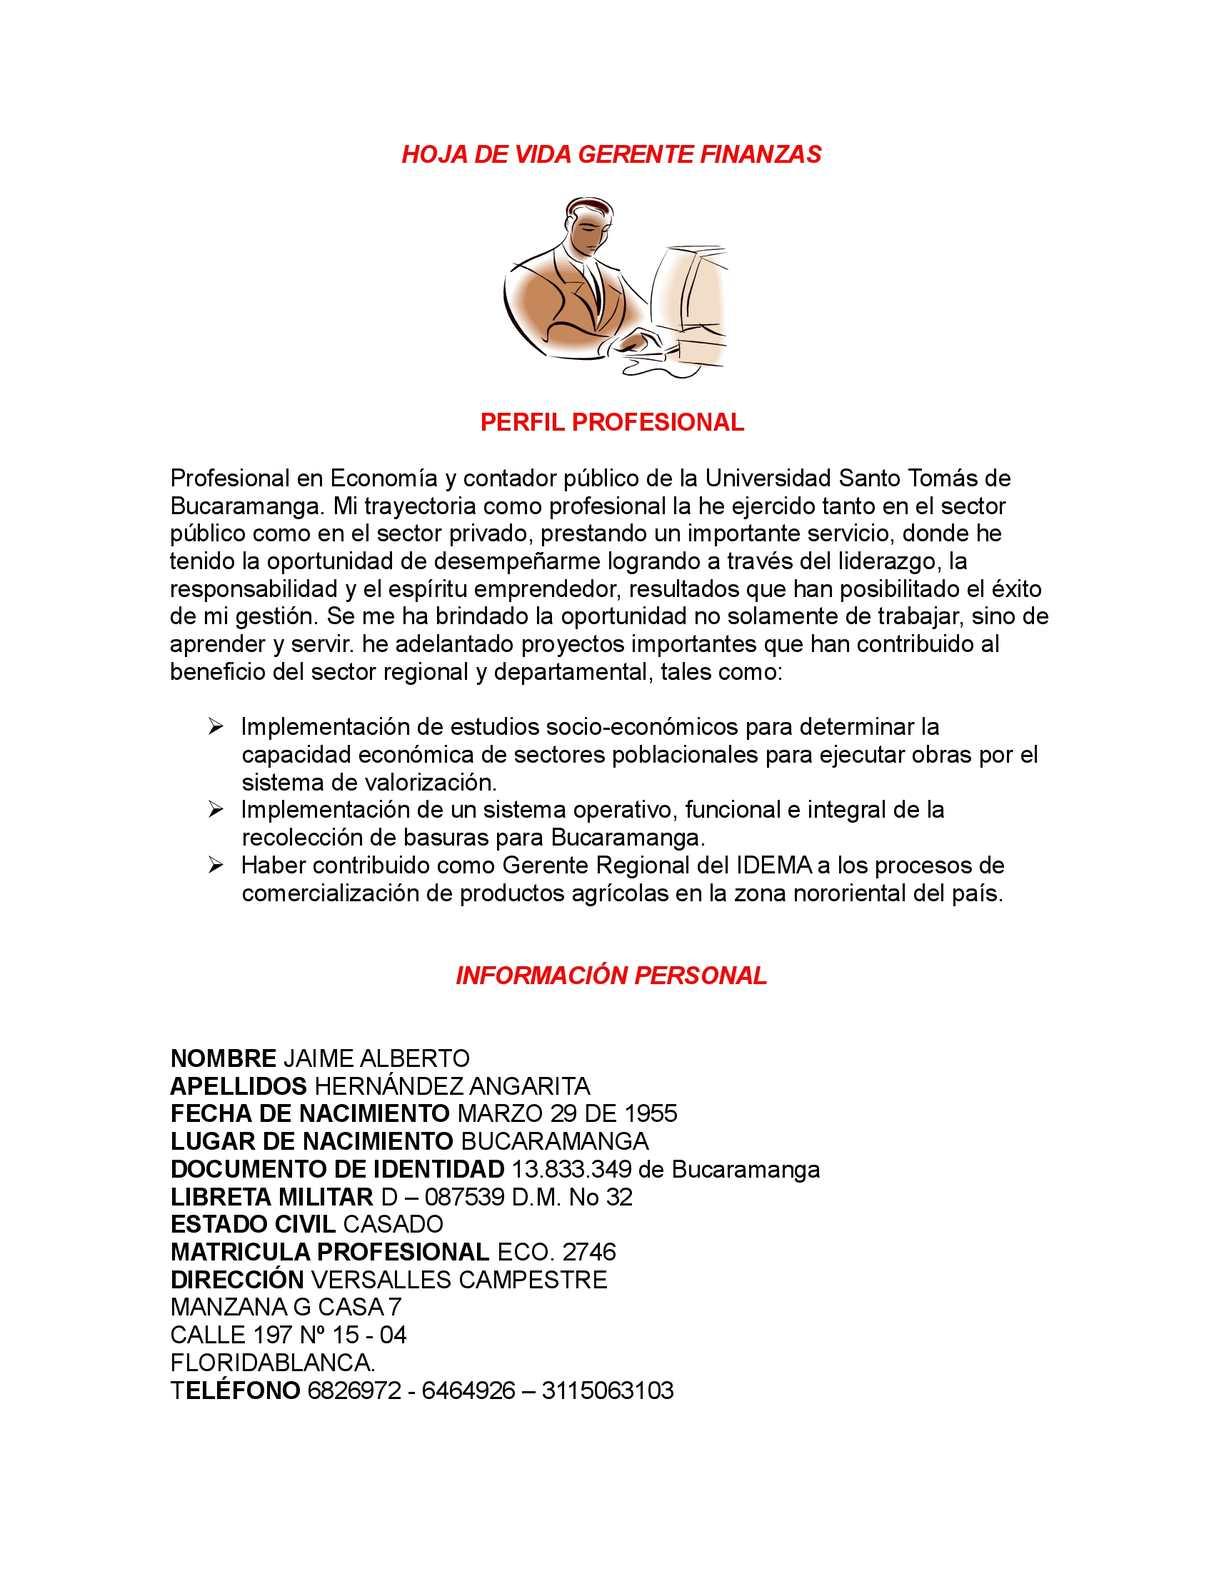 Calaméo - HOJA DE VIDA GERENTE